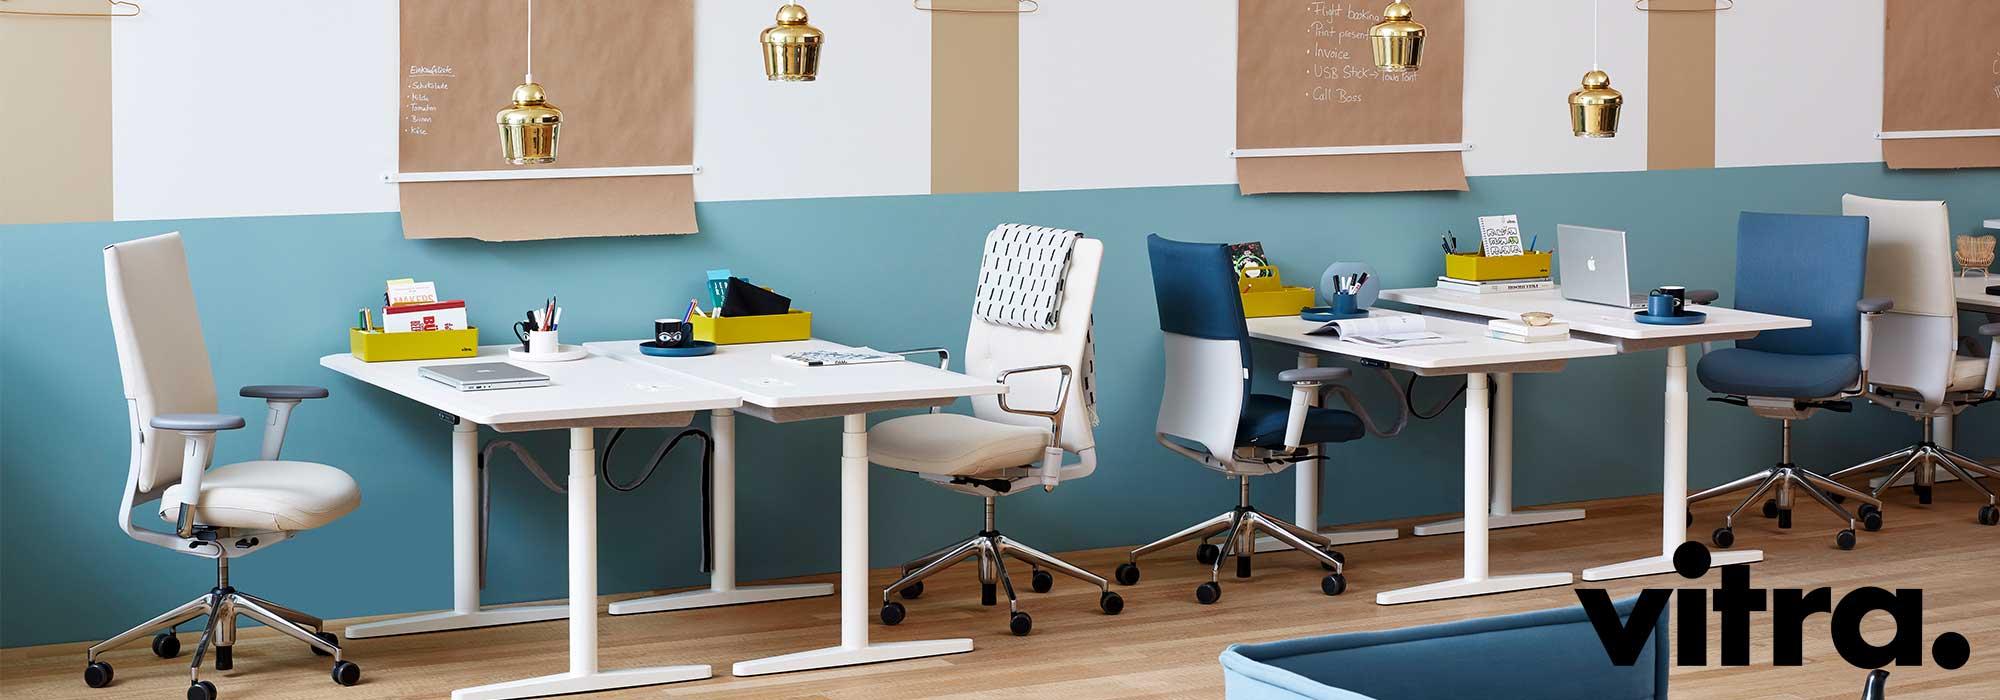 Vitra ID Chairs & Tyde Desking